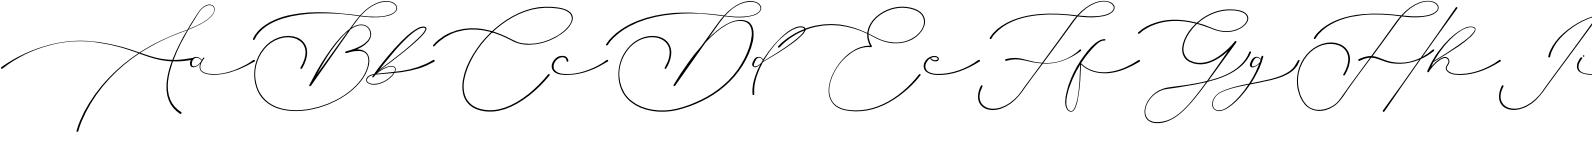 Clarinta